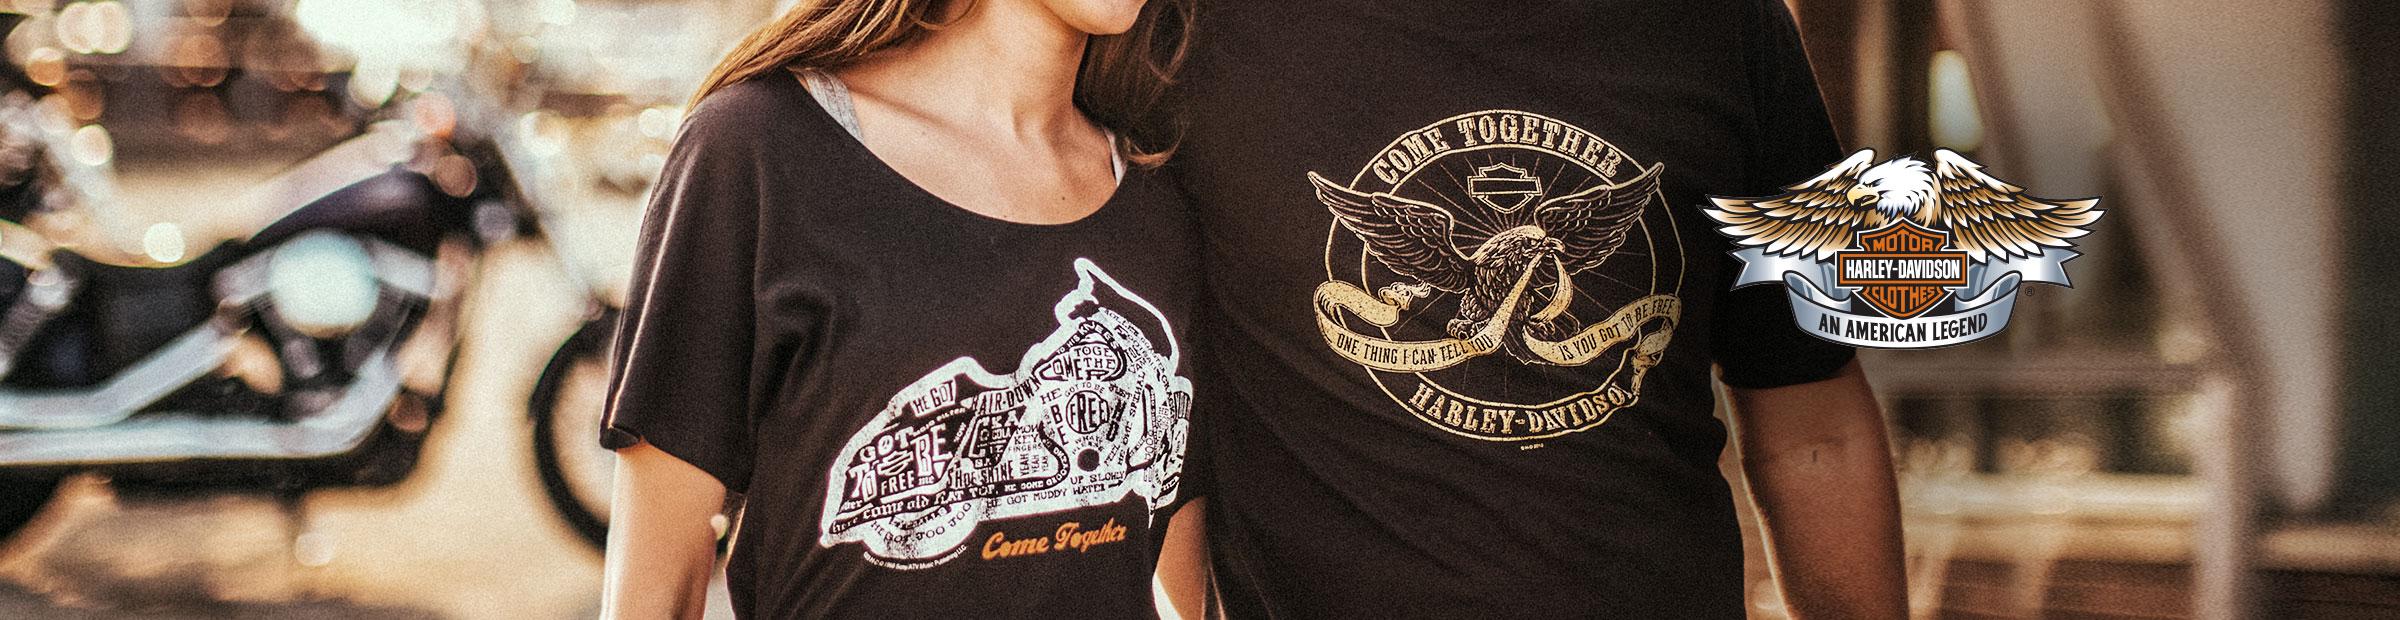 MotorClothes<sup>&reg;</sup> &amp; Merchandise